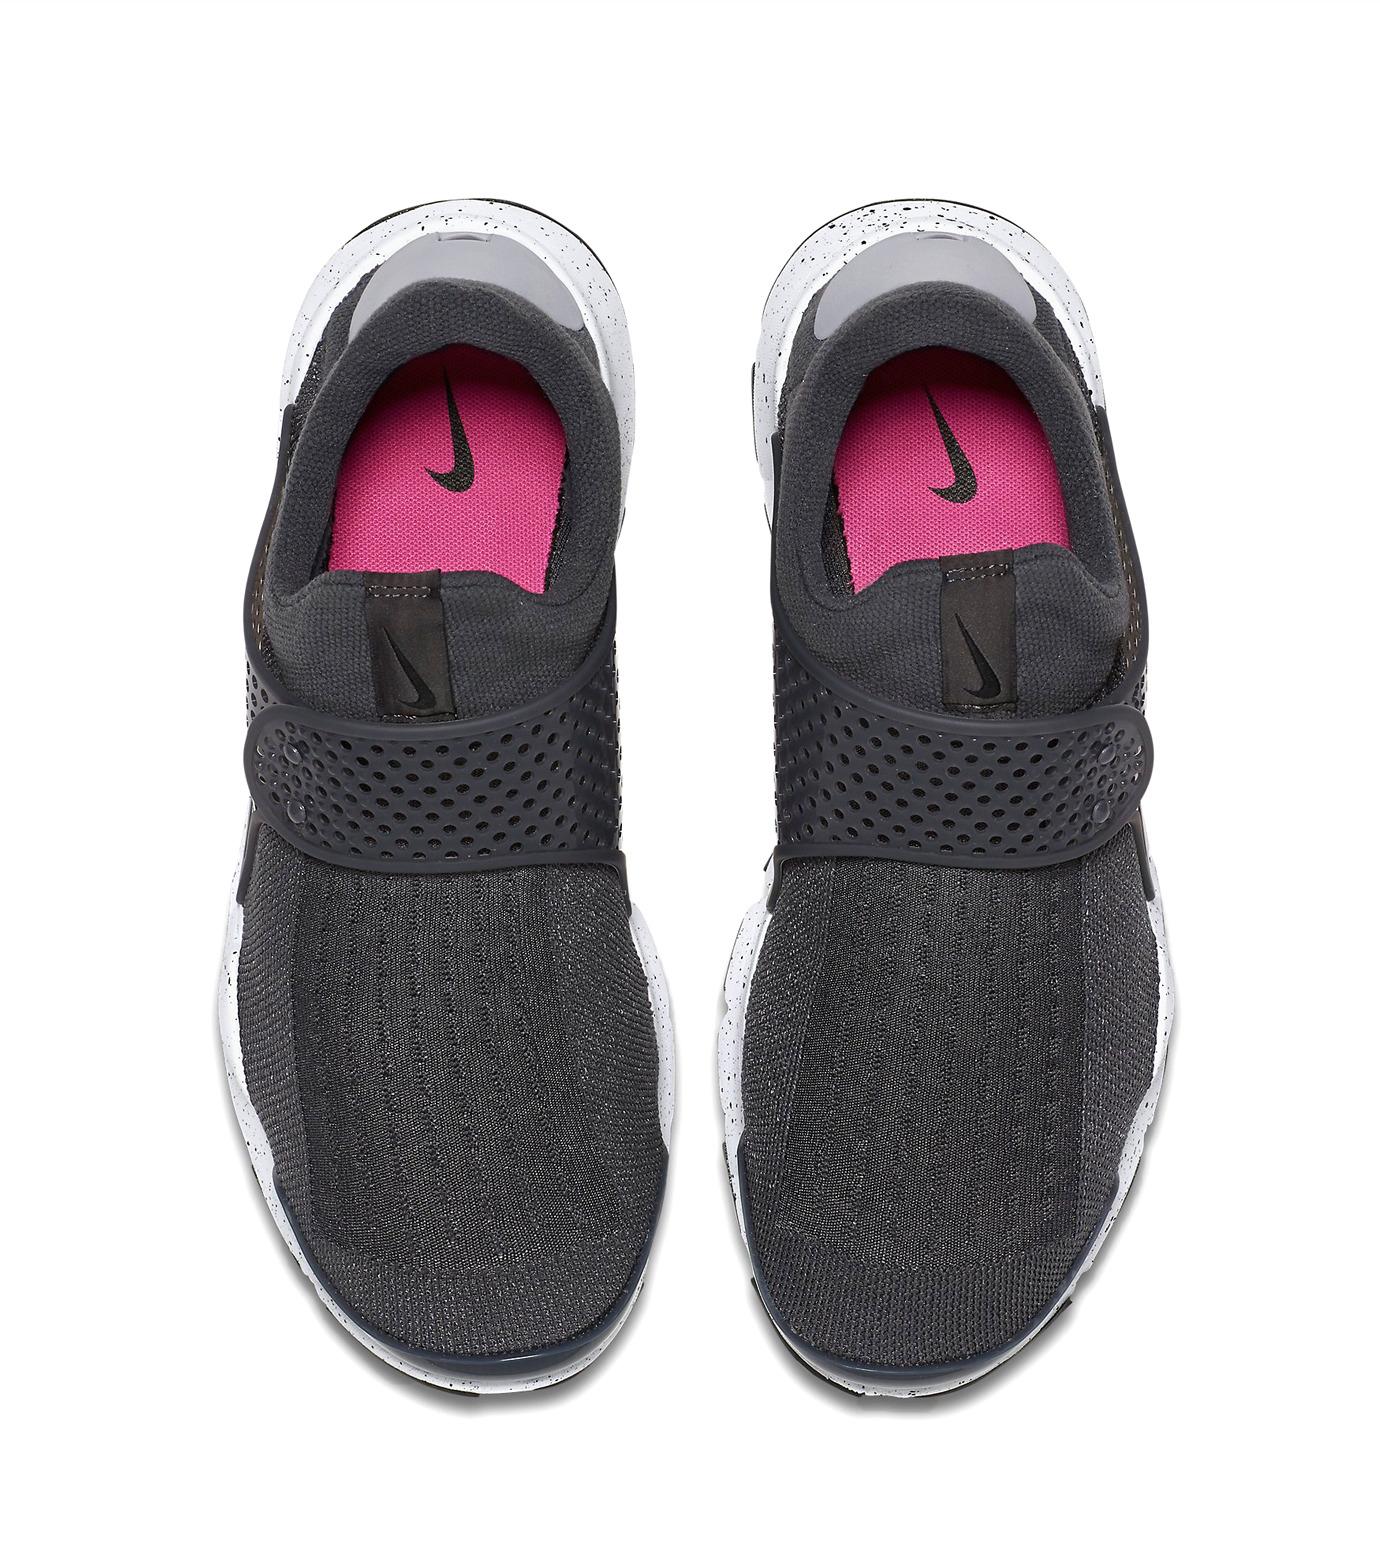 NIKE(ナイキ)のSOCK DART-GRAY(シューズ/shoes)-819686-003-11 拡大詳細画像4